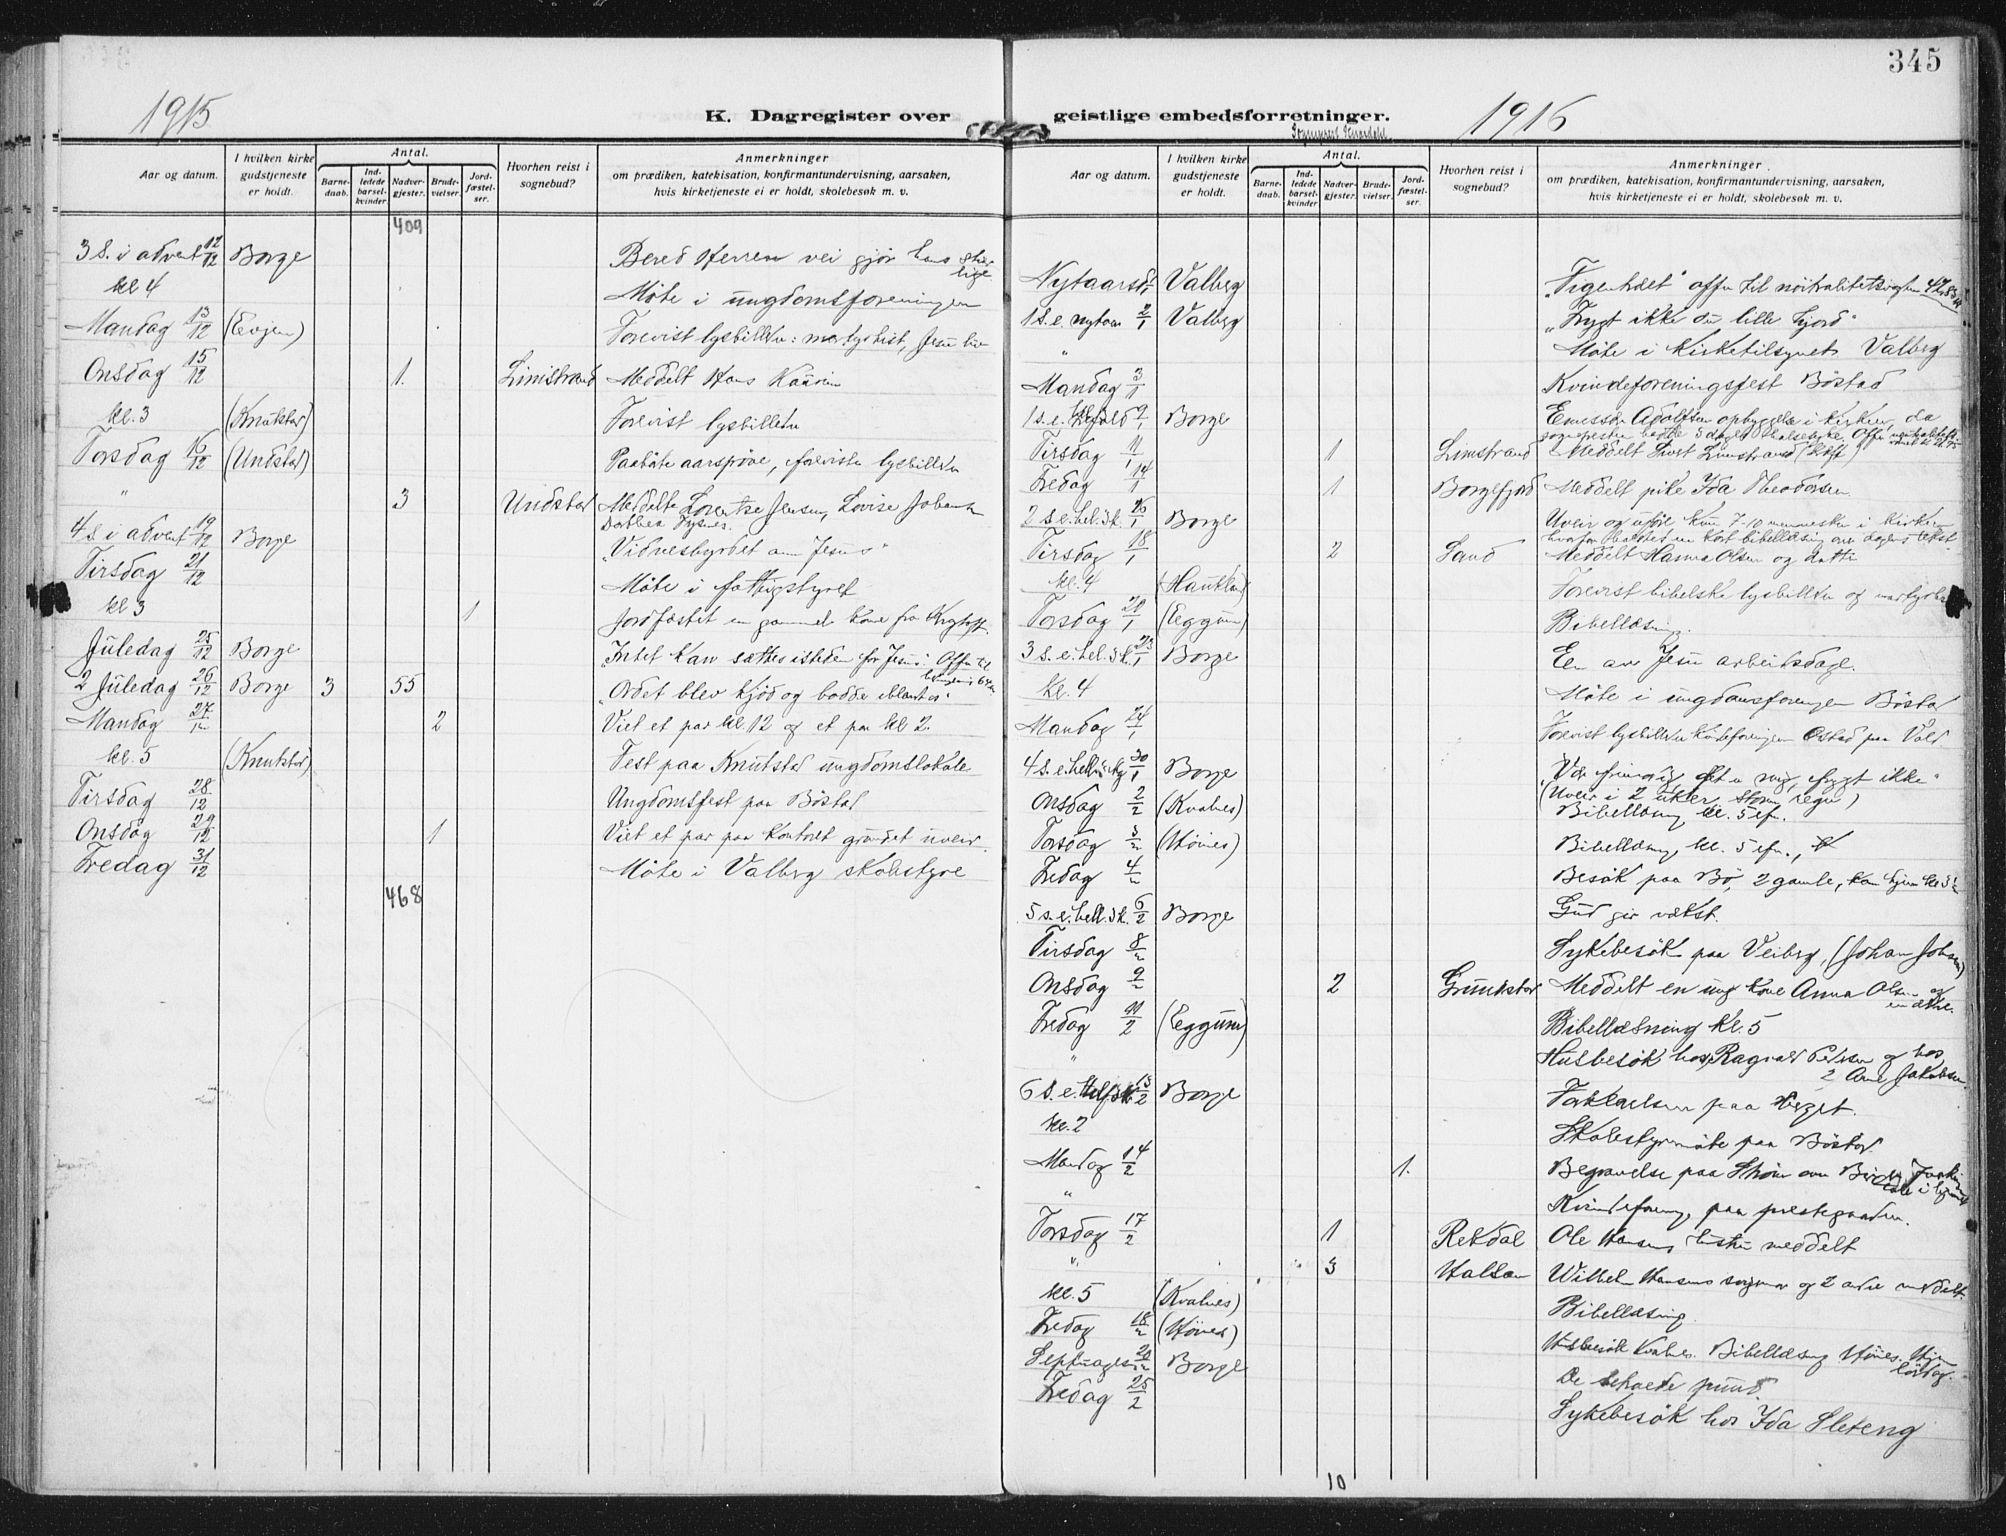 SAT, Ministerialprotokoller, klokkerbøker og fødselsregistre - Nordland, 880/L1135: Ministerialbok nr. 880A09, 1908-1919, s. 345